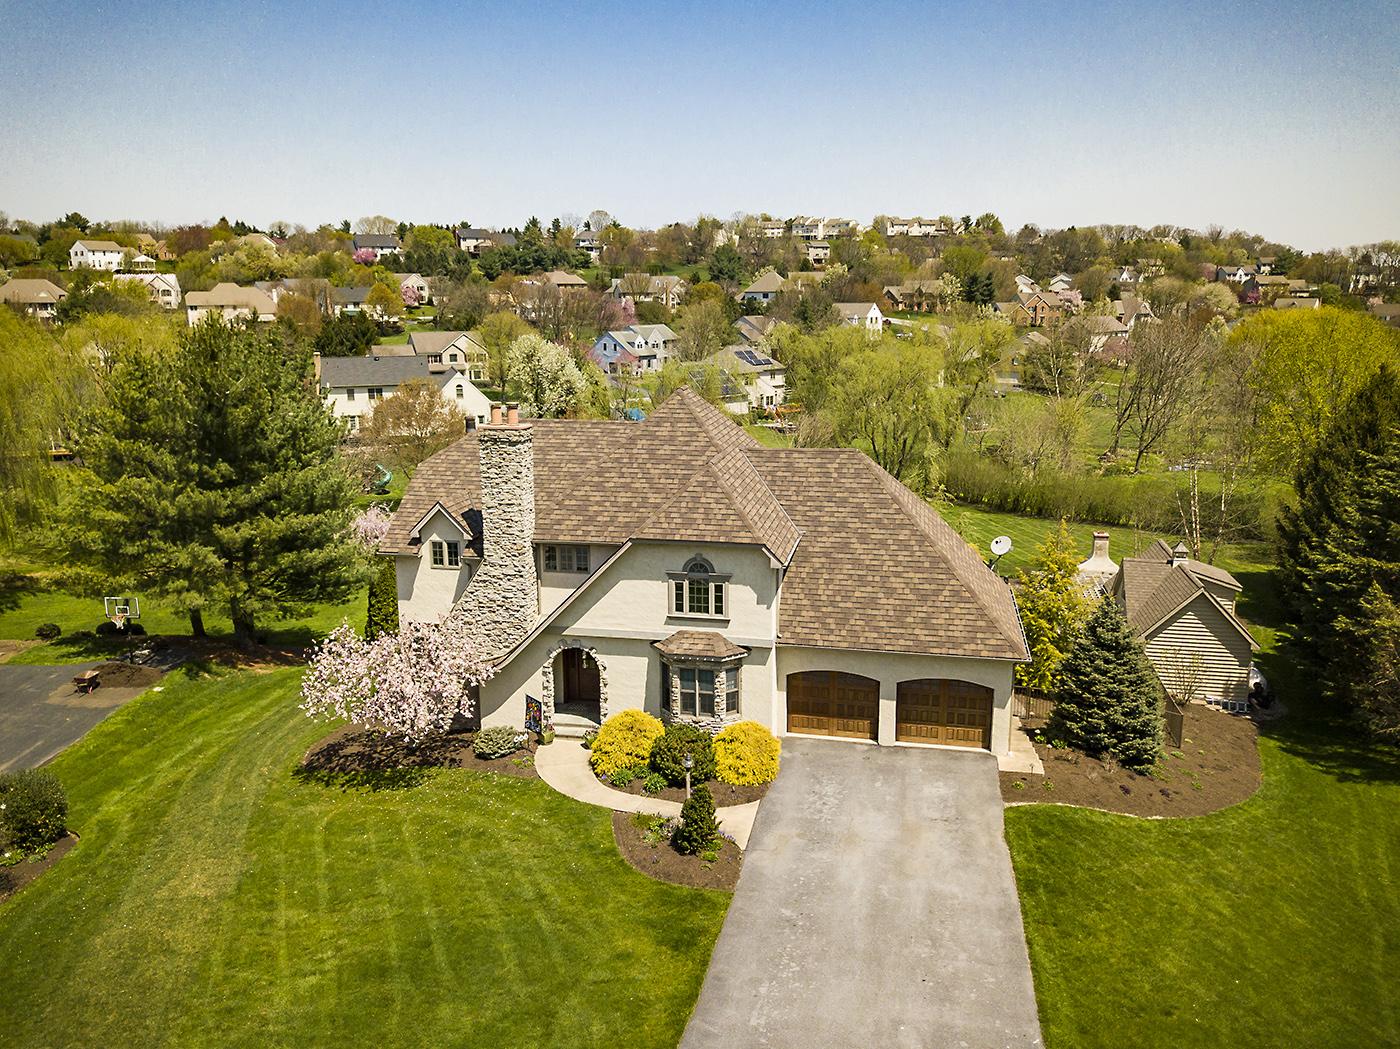 Lancaster PA Real Estate Drone Photo